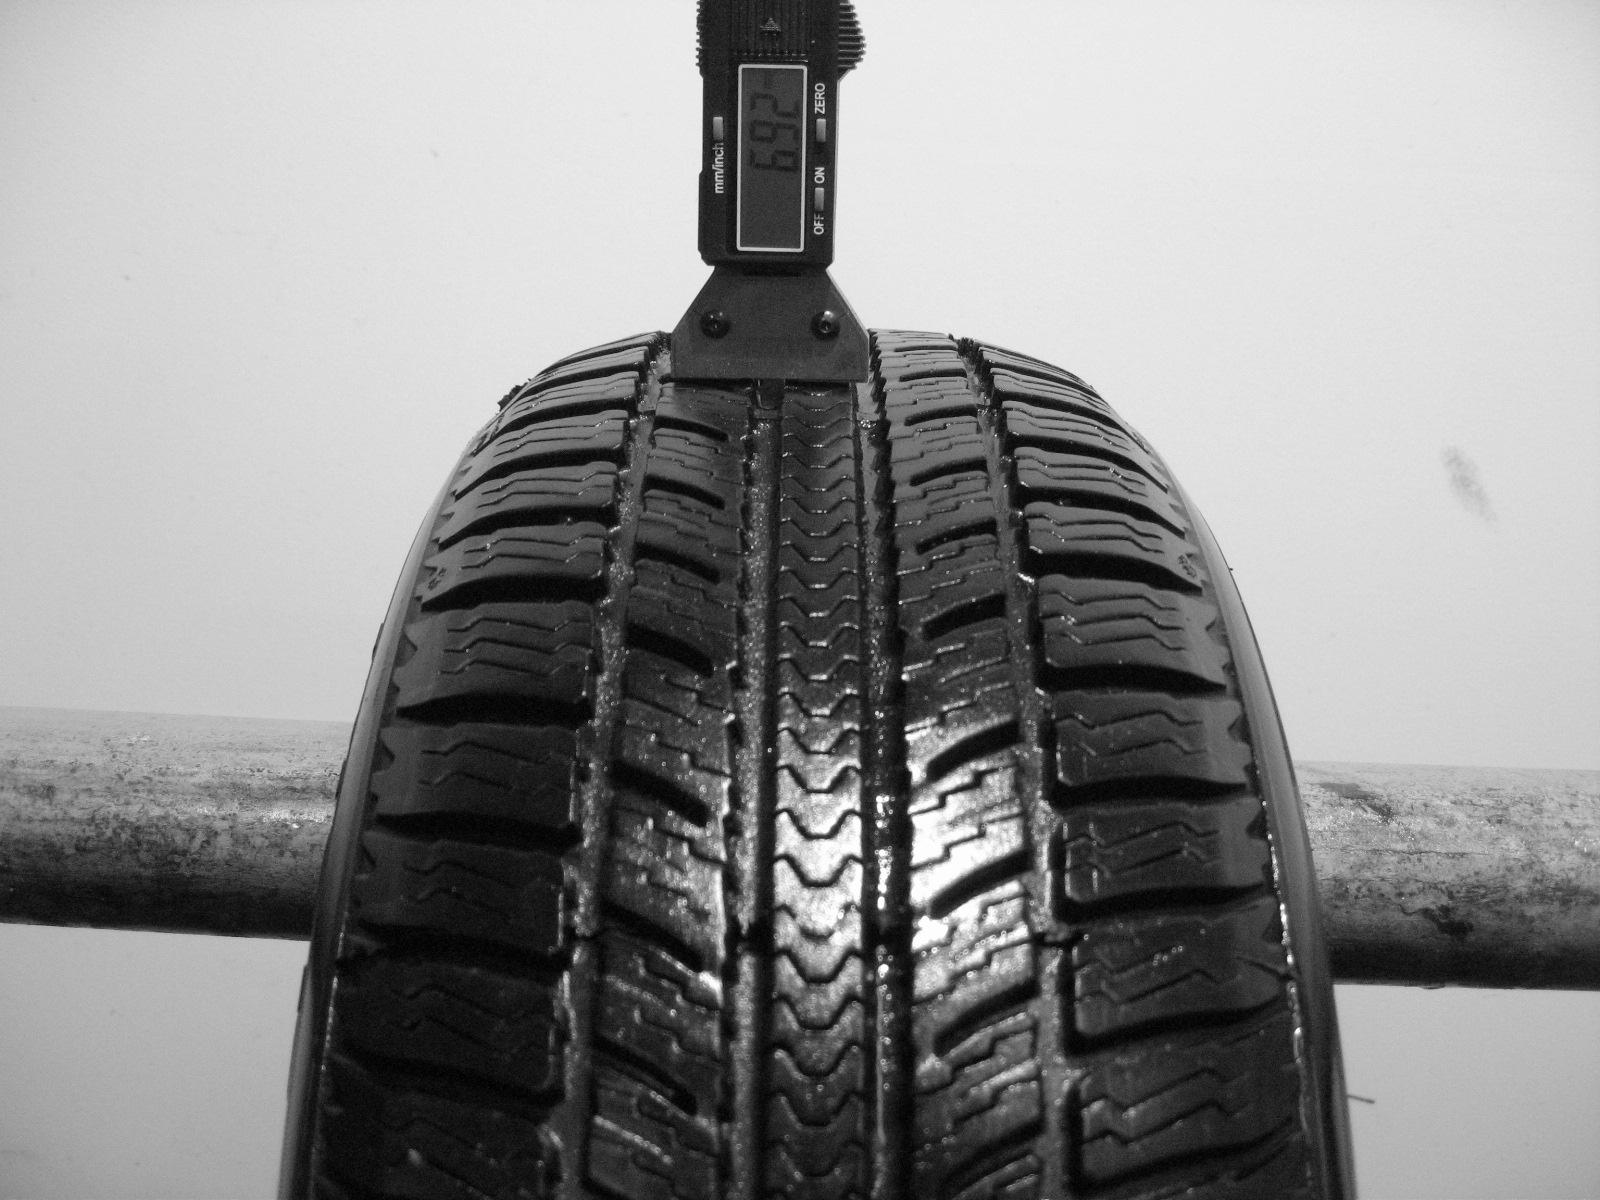 Použité-Pneu-Bazar - 185/60 R14 BF GOODRICH WINTER G -kusovka-rezerva 3mm